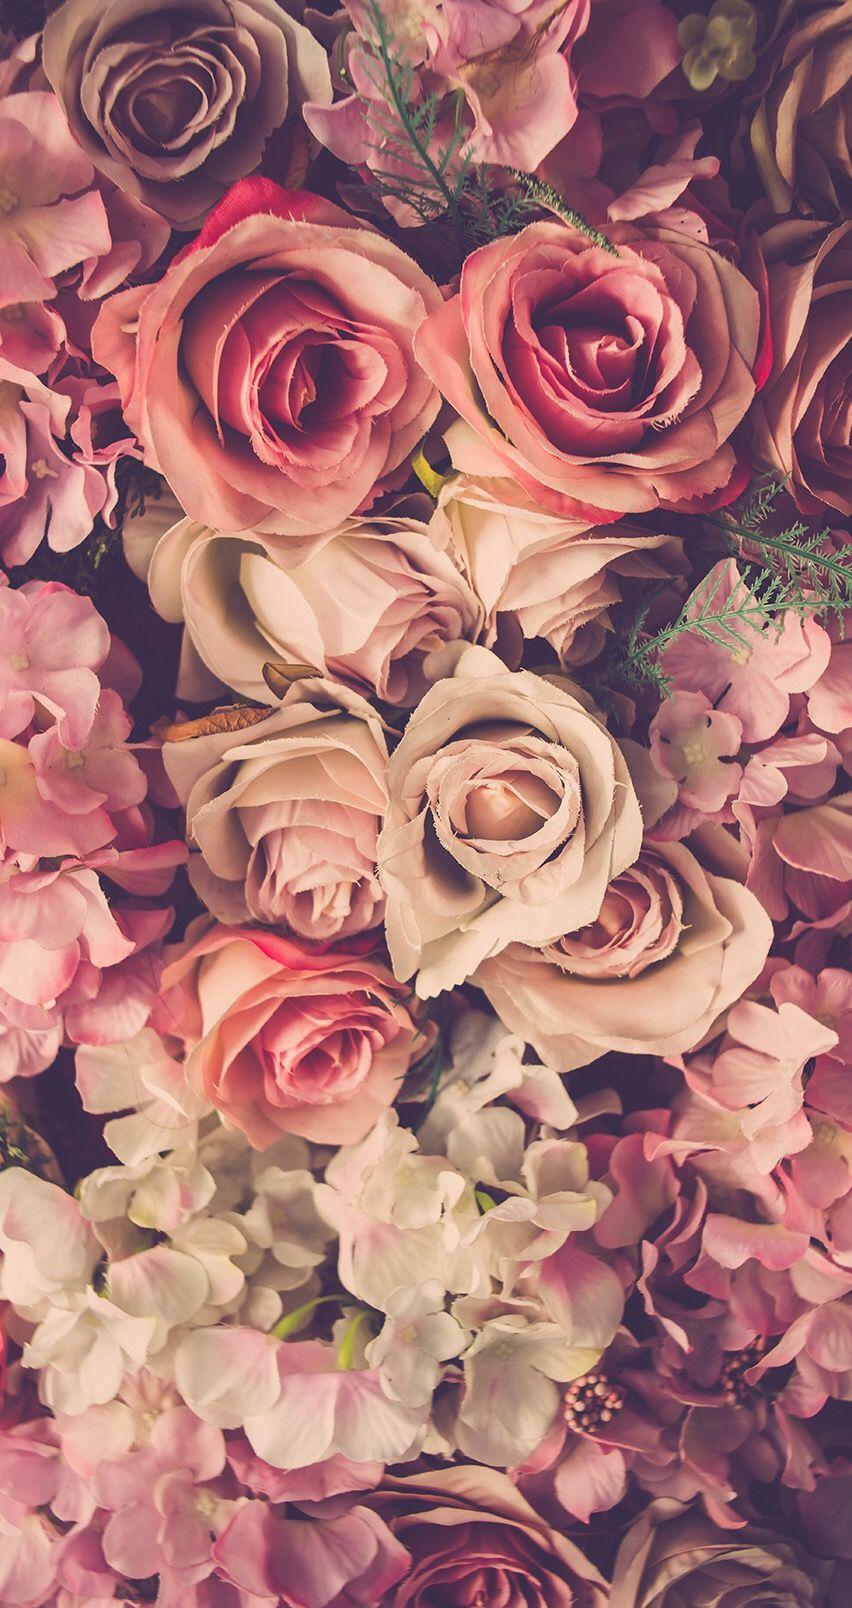 Pin Di Jane Doe Su Flowers Nel 2020 Sfondi Iphone Sfondi